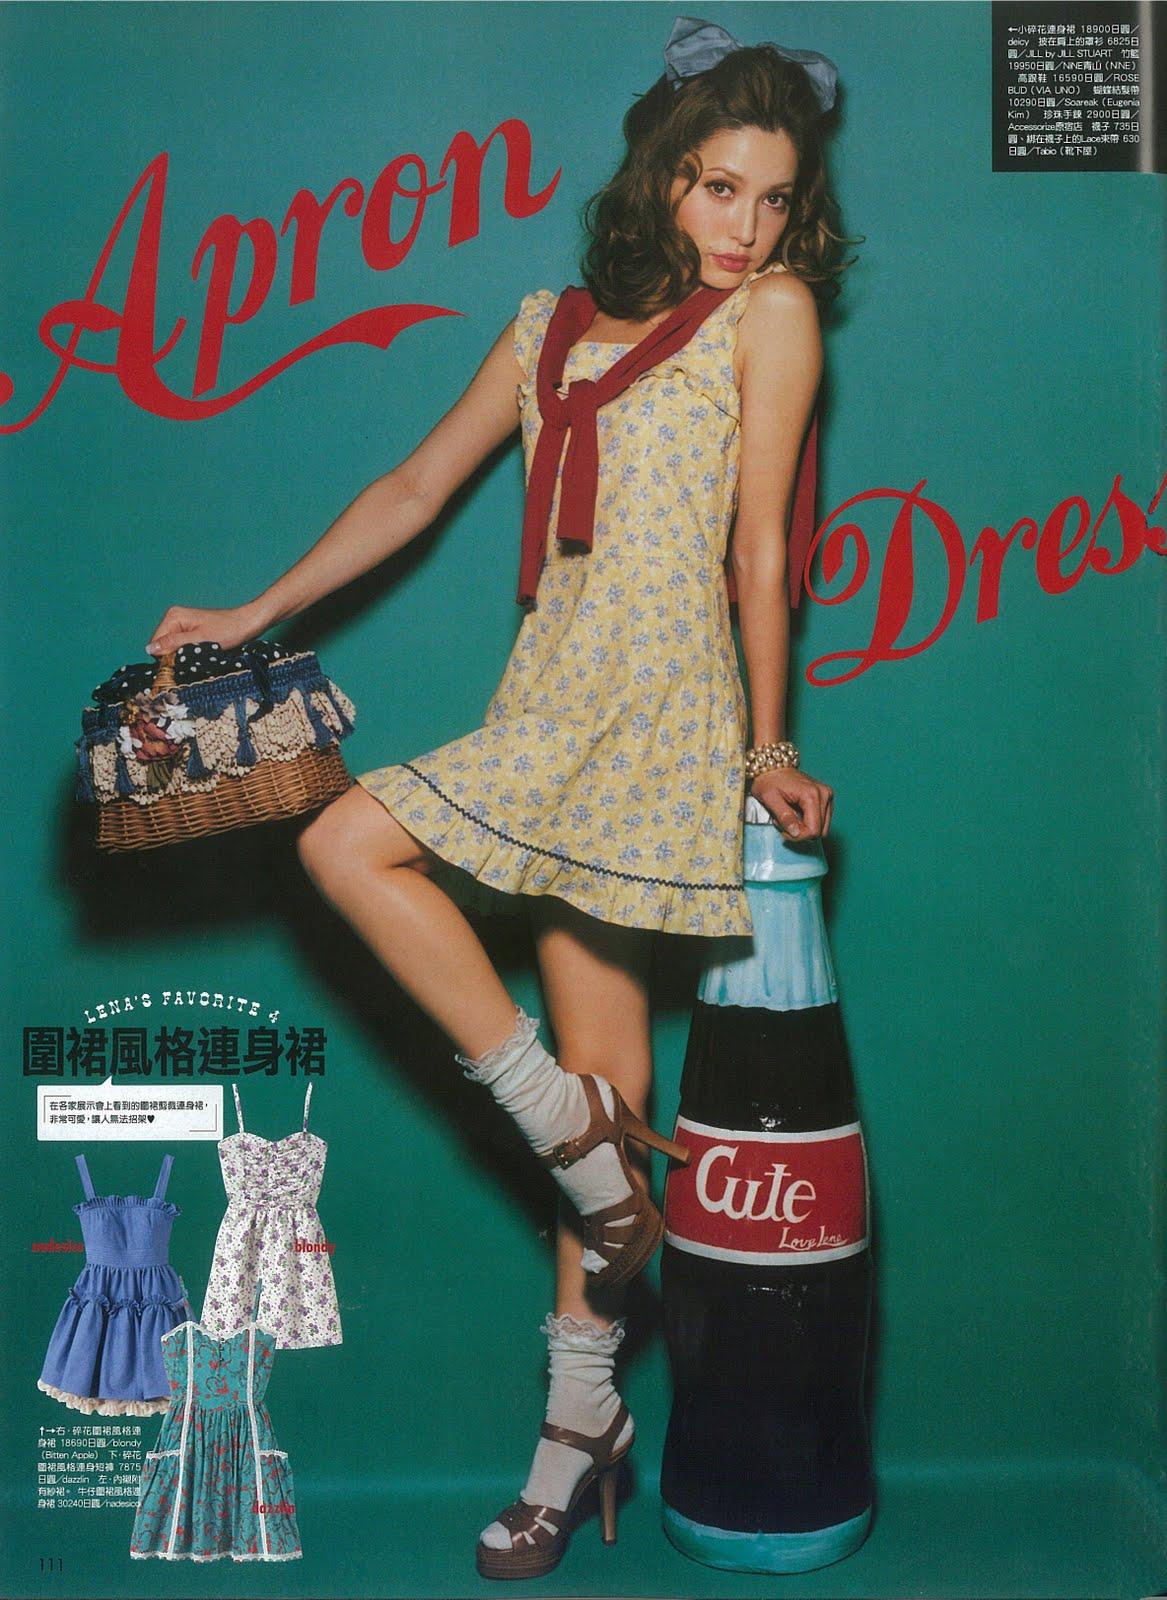 *High On Fashion: Inside a Japanese Magazine